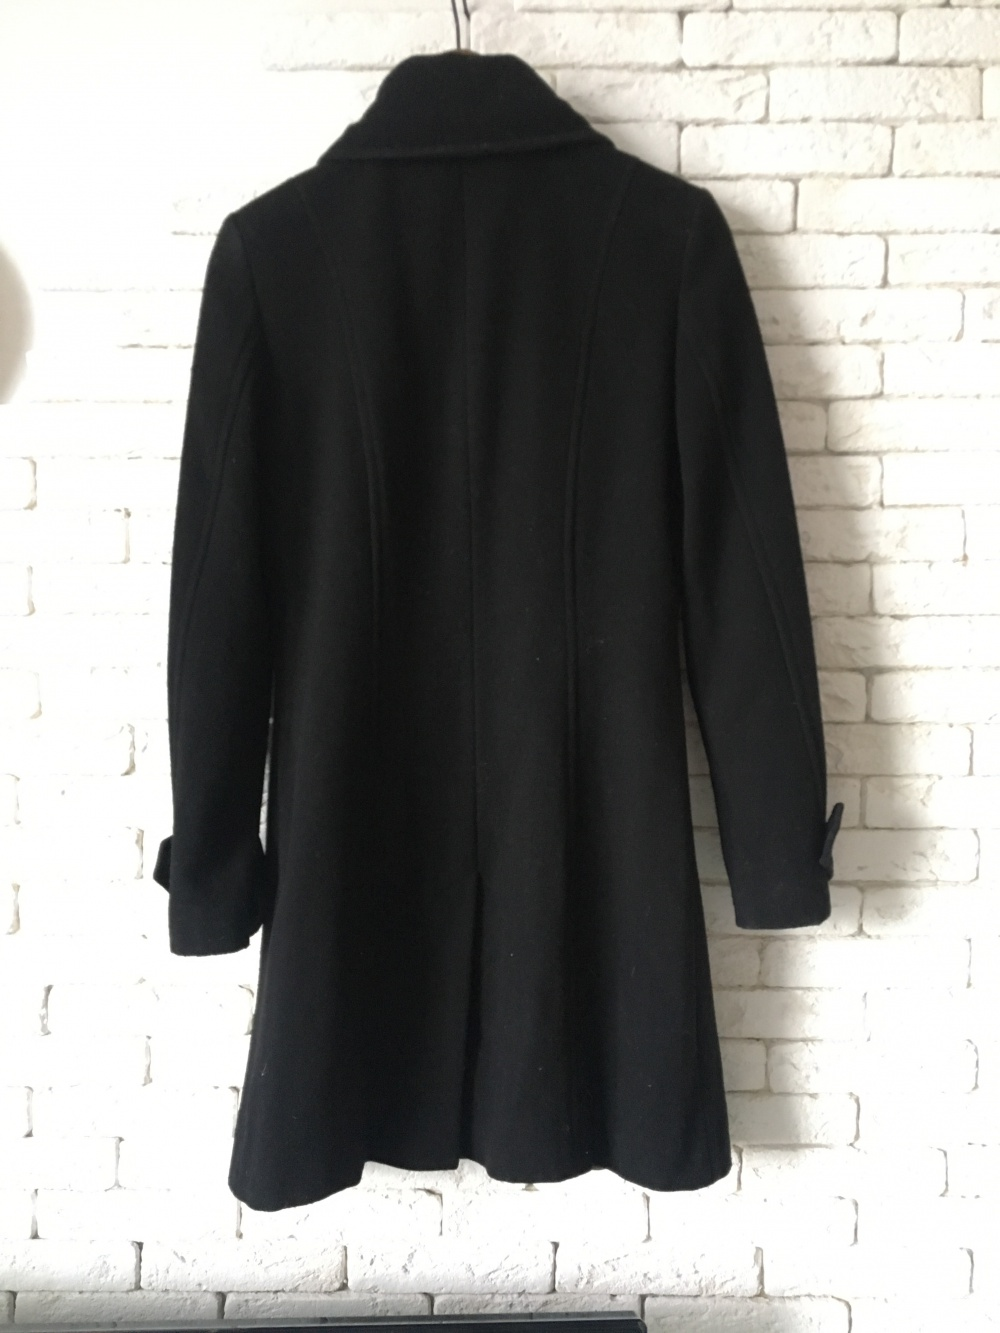 Пальто MEXX, S, шерсть